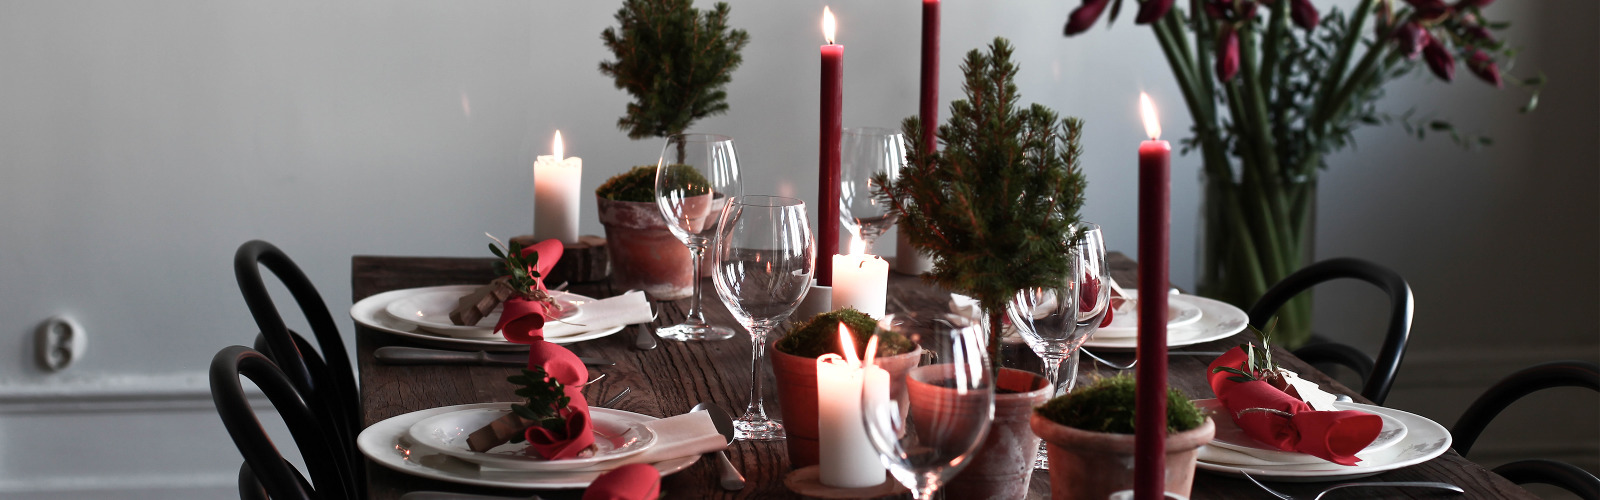 christmas_tablesetting_original.jpg